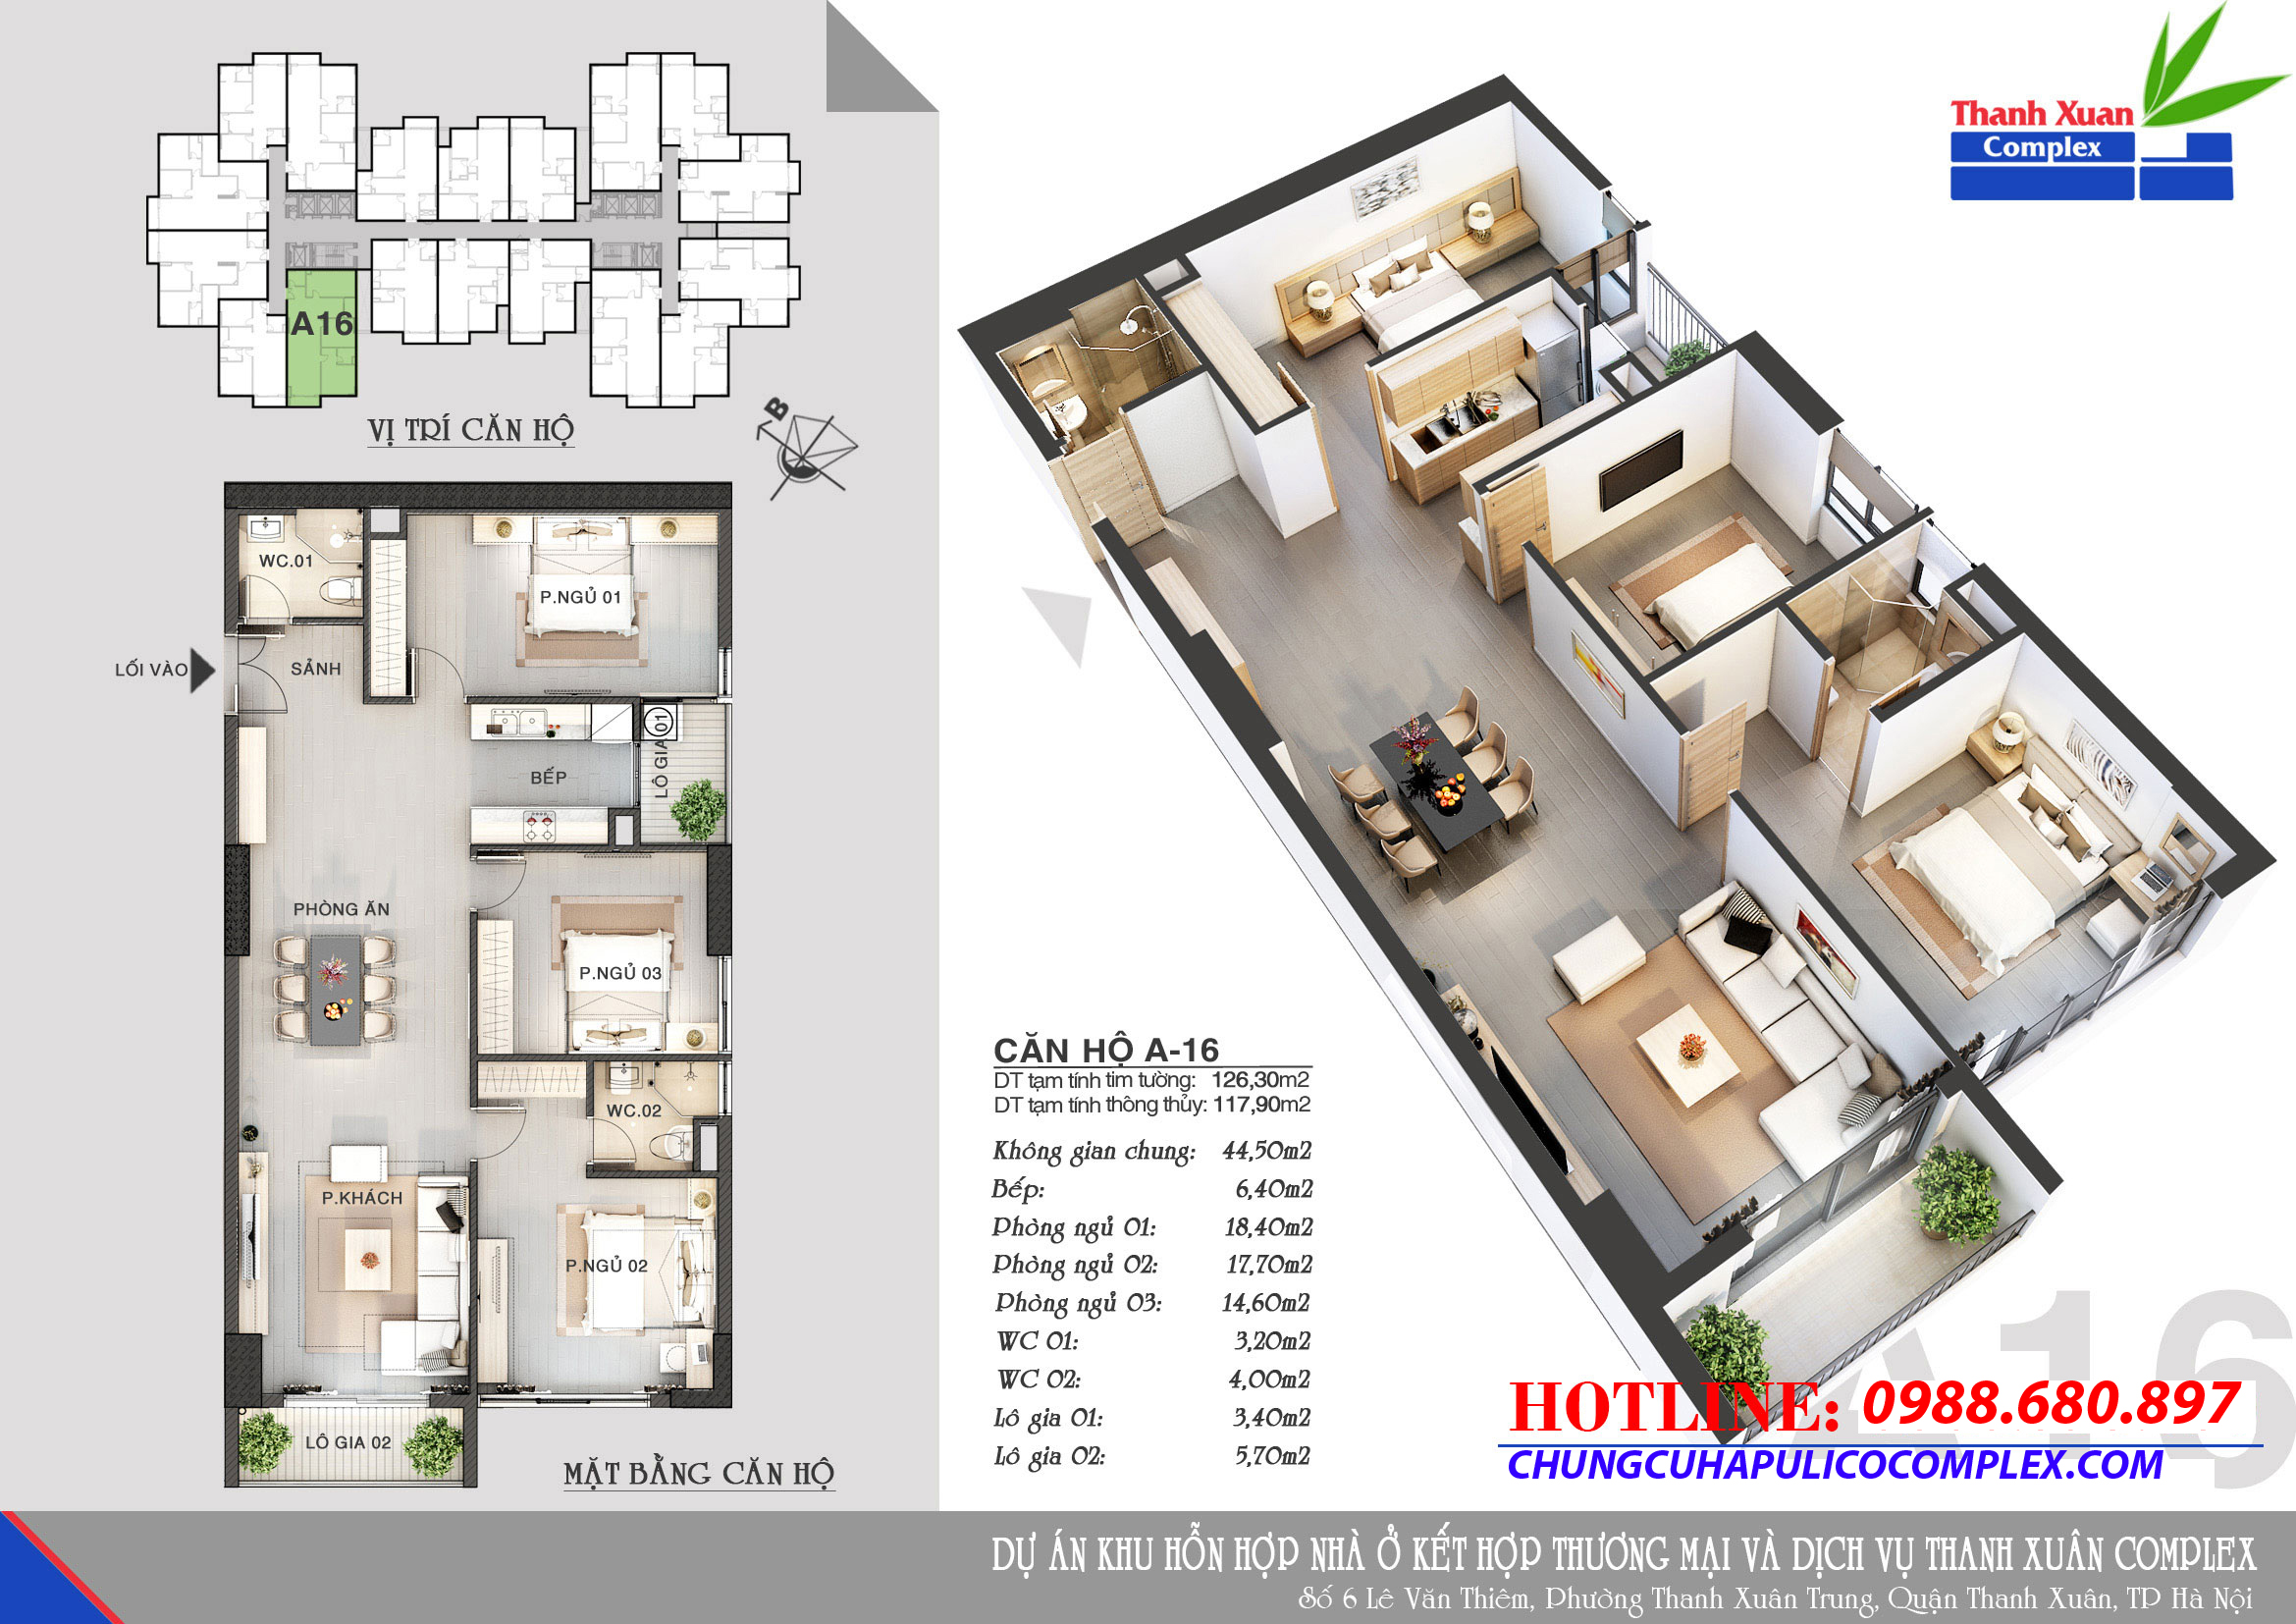 HSB_Thanhxuan-complex_CH-A16_suachotT42016-copy